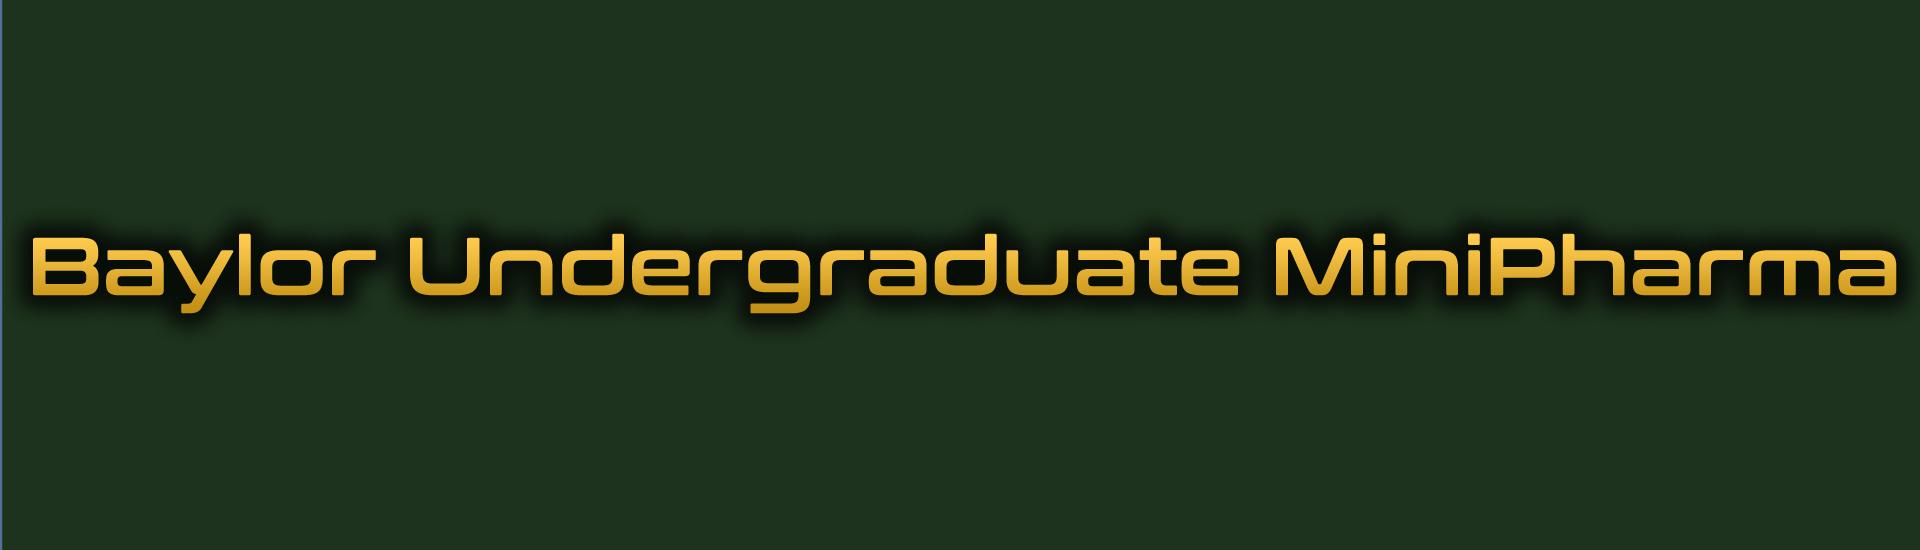 Baylor Undergraduate Minipharma